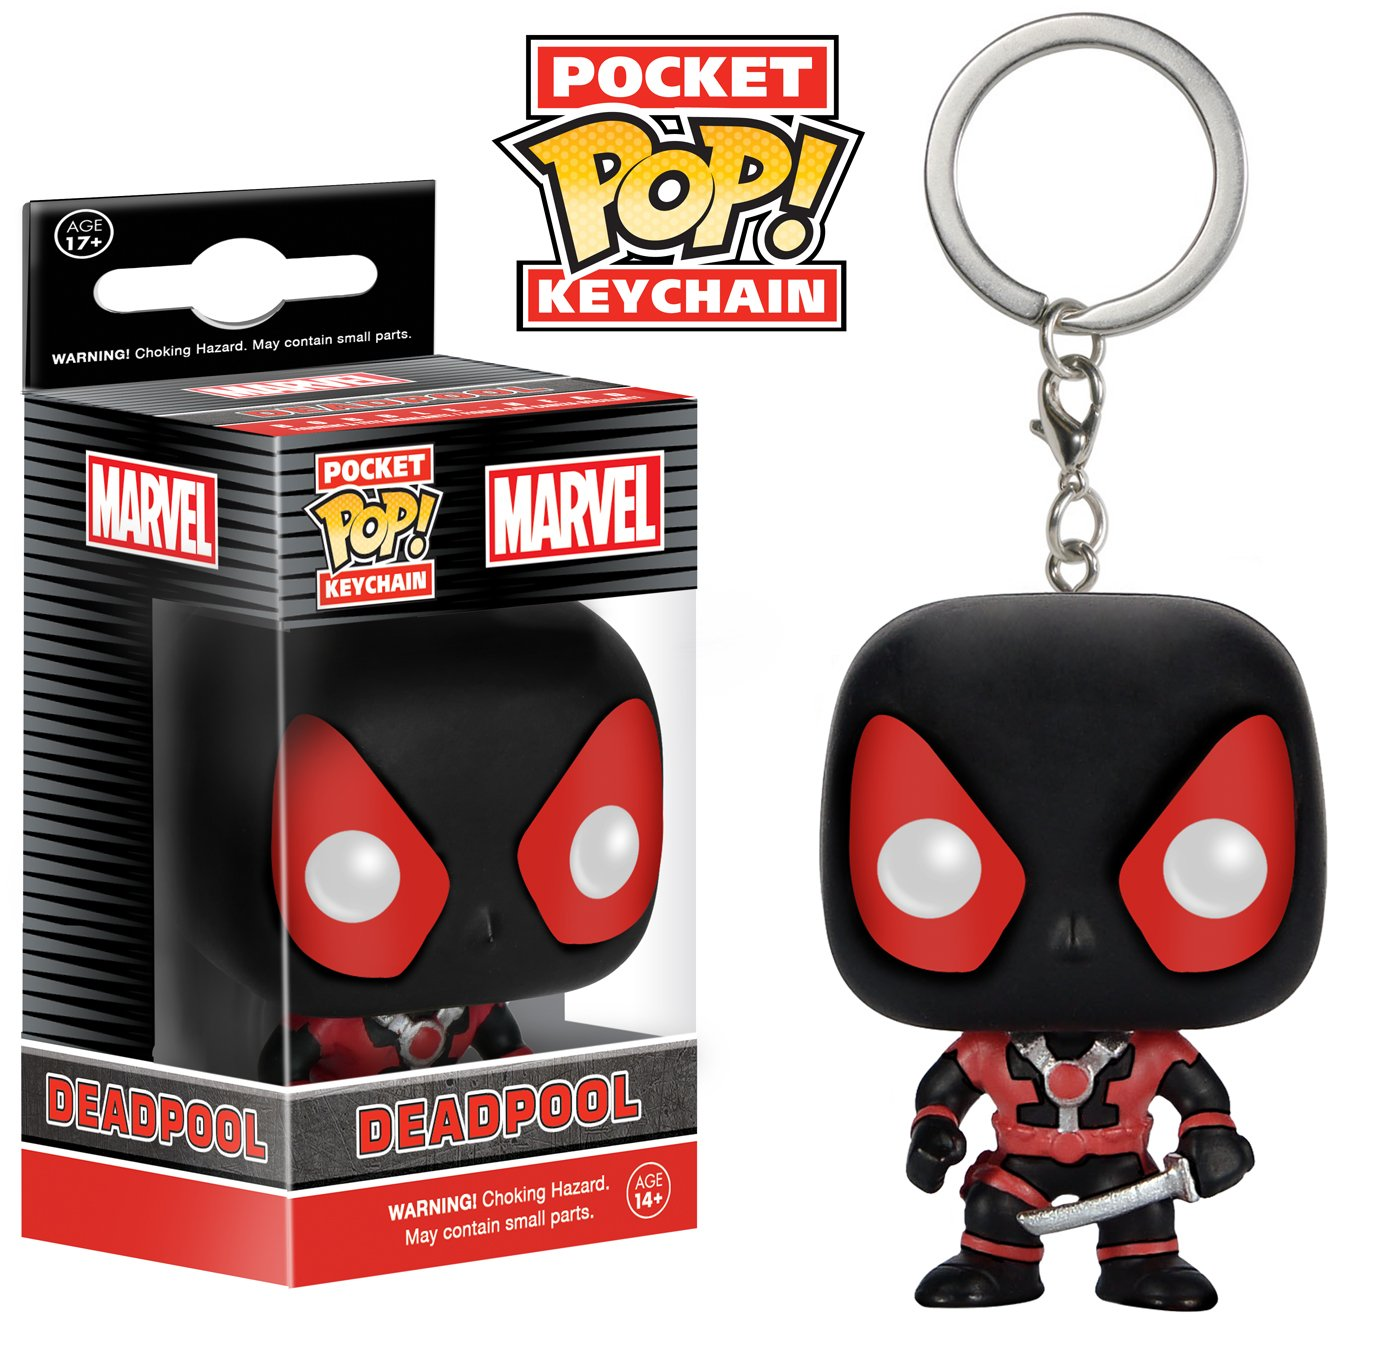 Funko POP Keychain Marvel Black Suit Deadpool Action Figure 7512 Accessory Toys /& Games